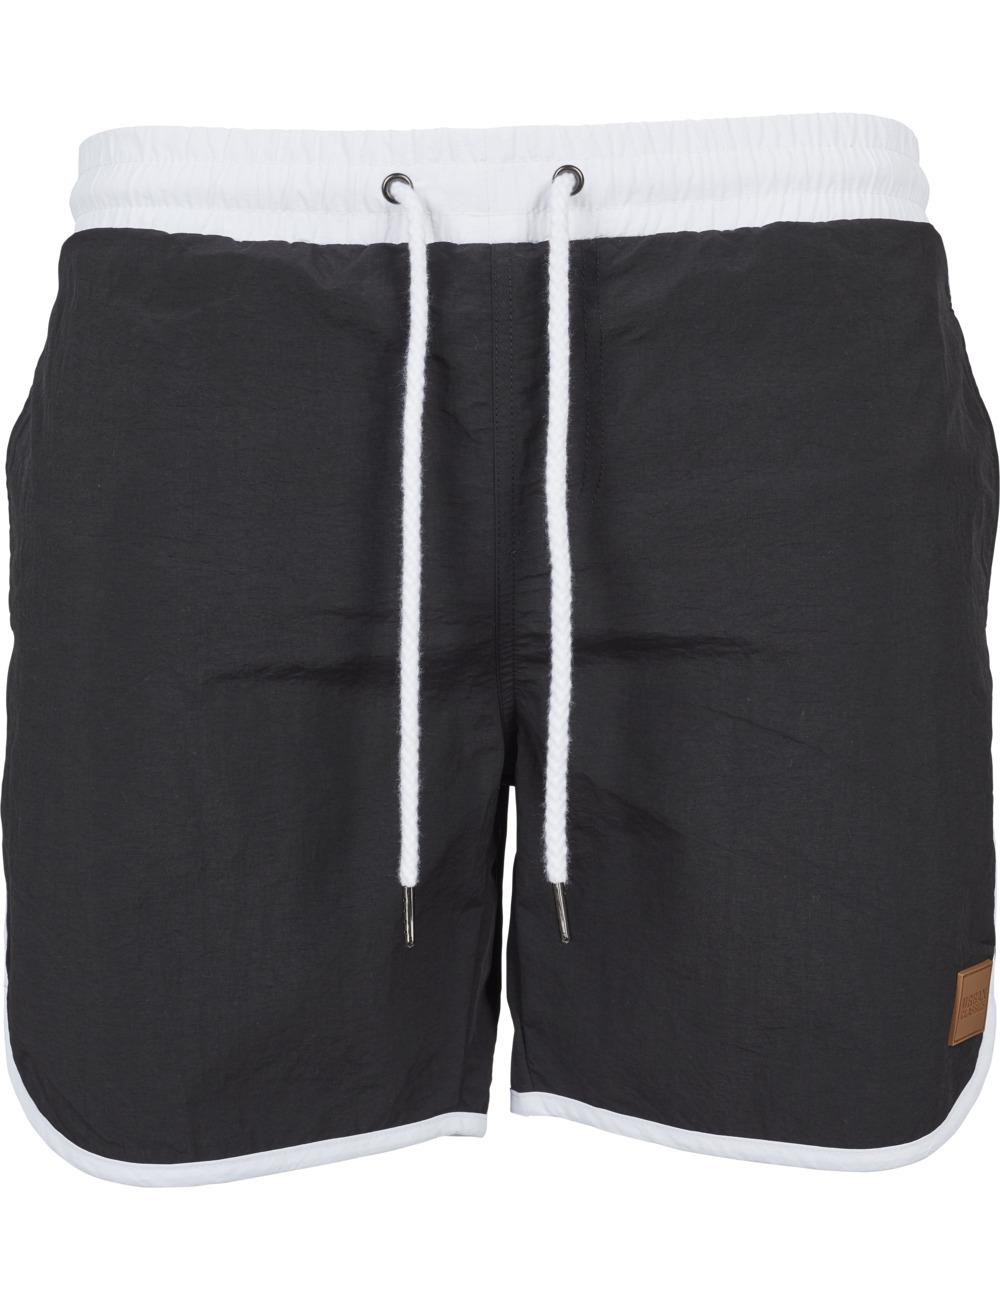 urban-classics-herren-badehose-retro-swimshorts-regular-fit, 19.90 EUR @ jeans